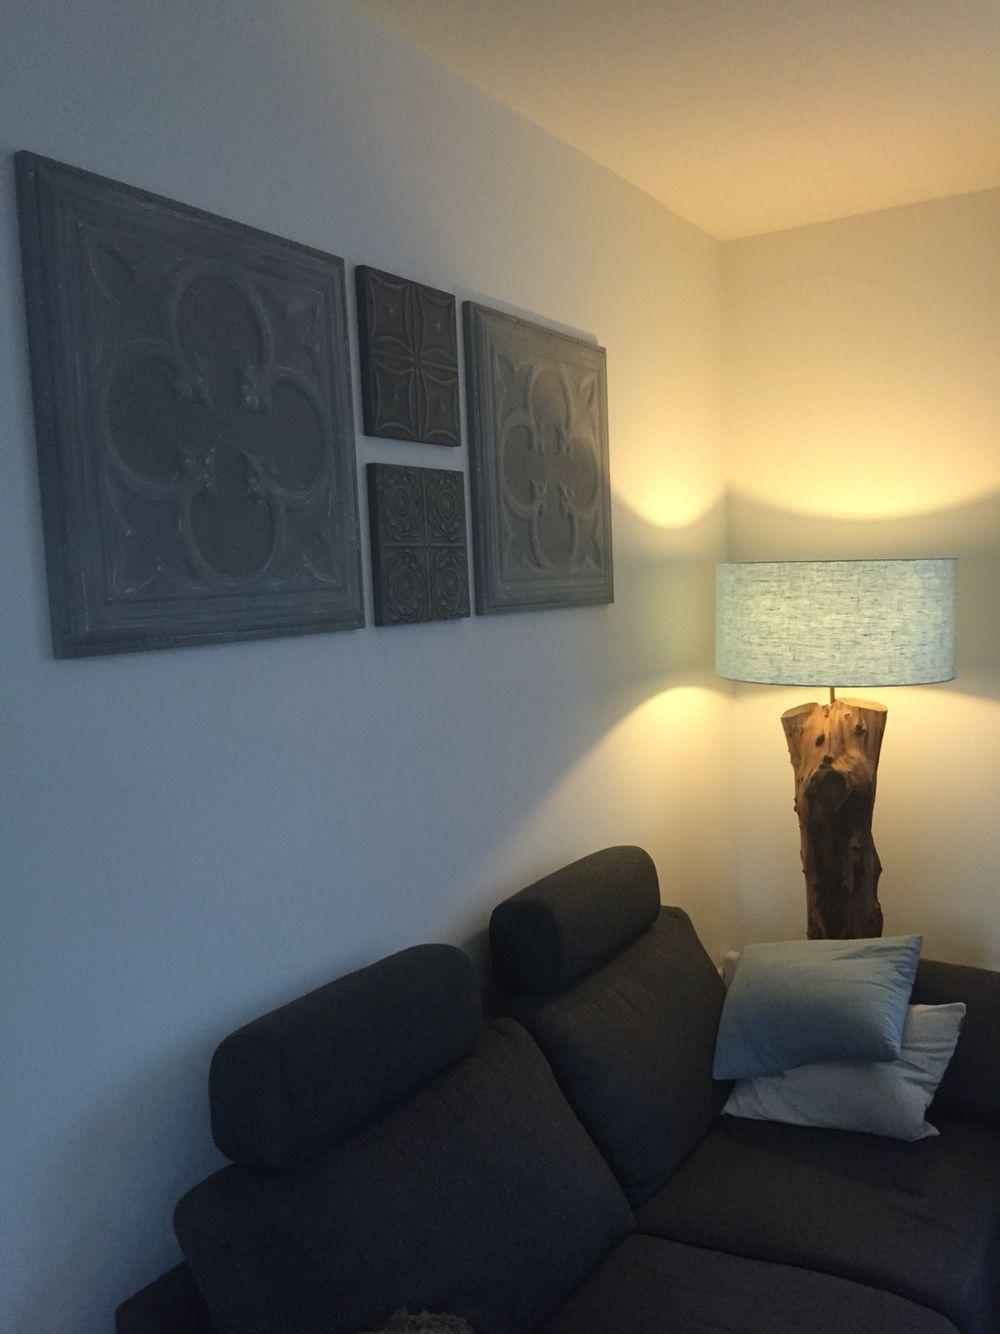 Houten Panelen Wanddecoratie.Wanddecoratie Artivue Stalen Panelen Op Een Houten Frame